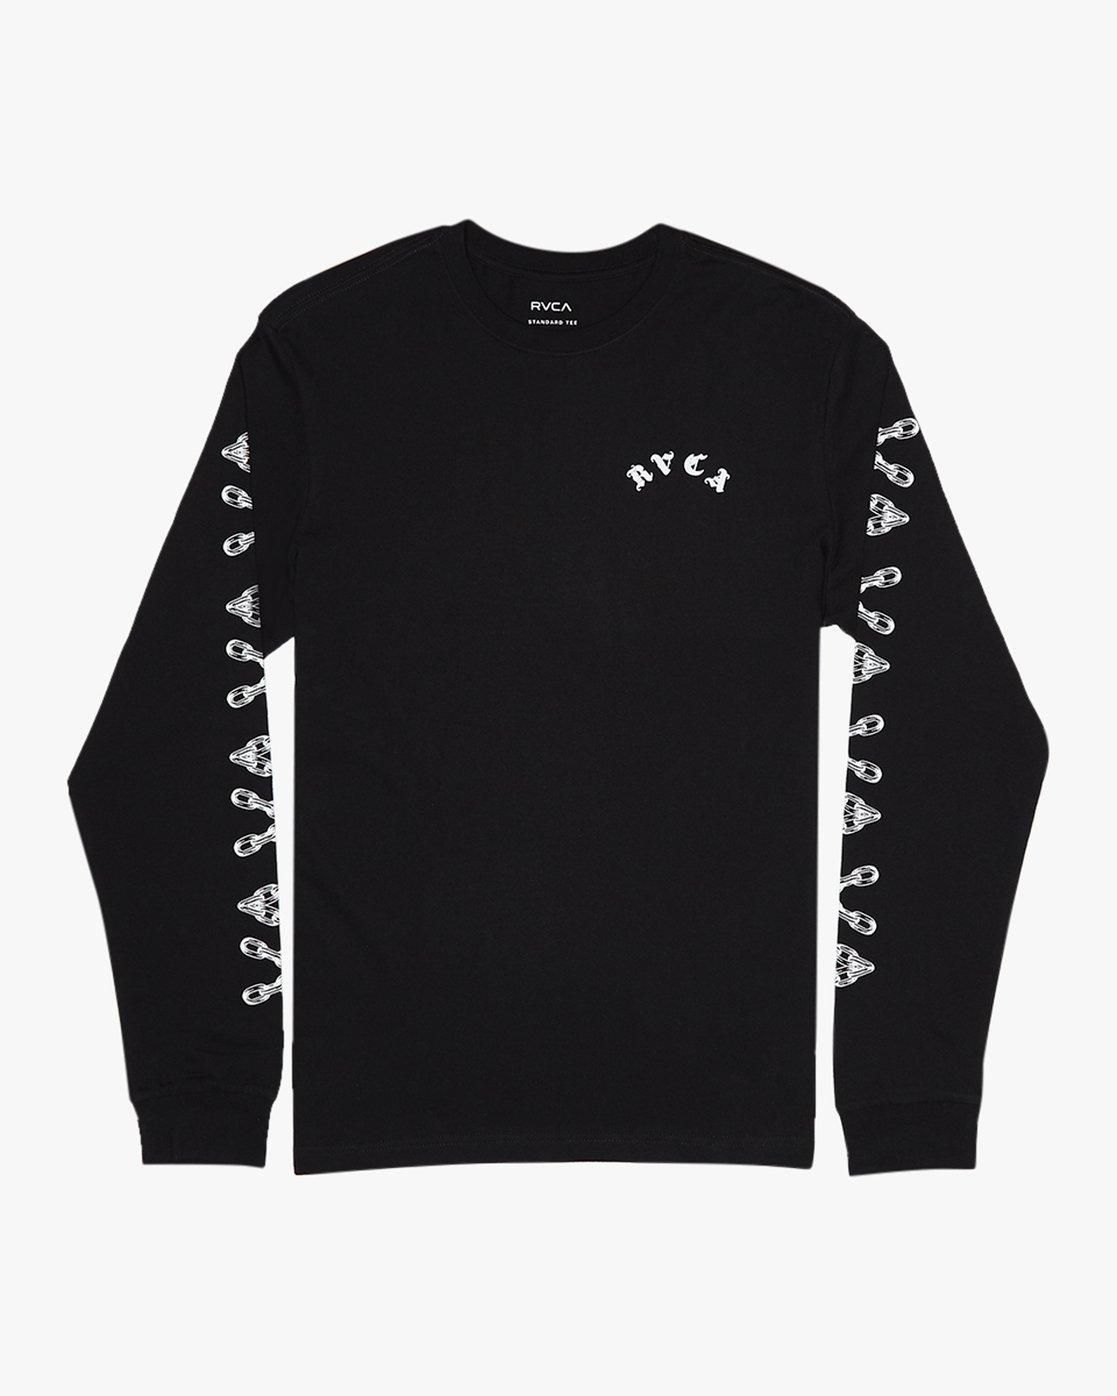 0 Benjamin Jeanjean JJ Mix  - Long Sleeve T-Shirt for Men Black Q1LSRFRVF9 RVCA